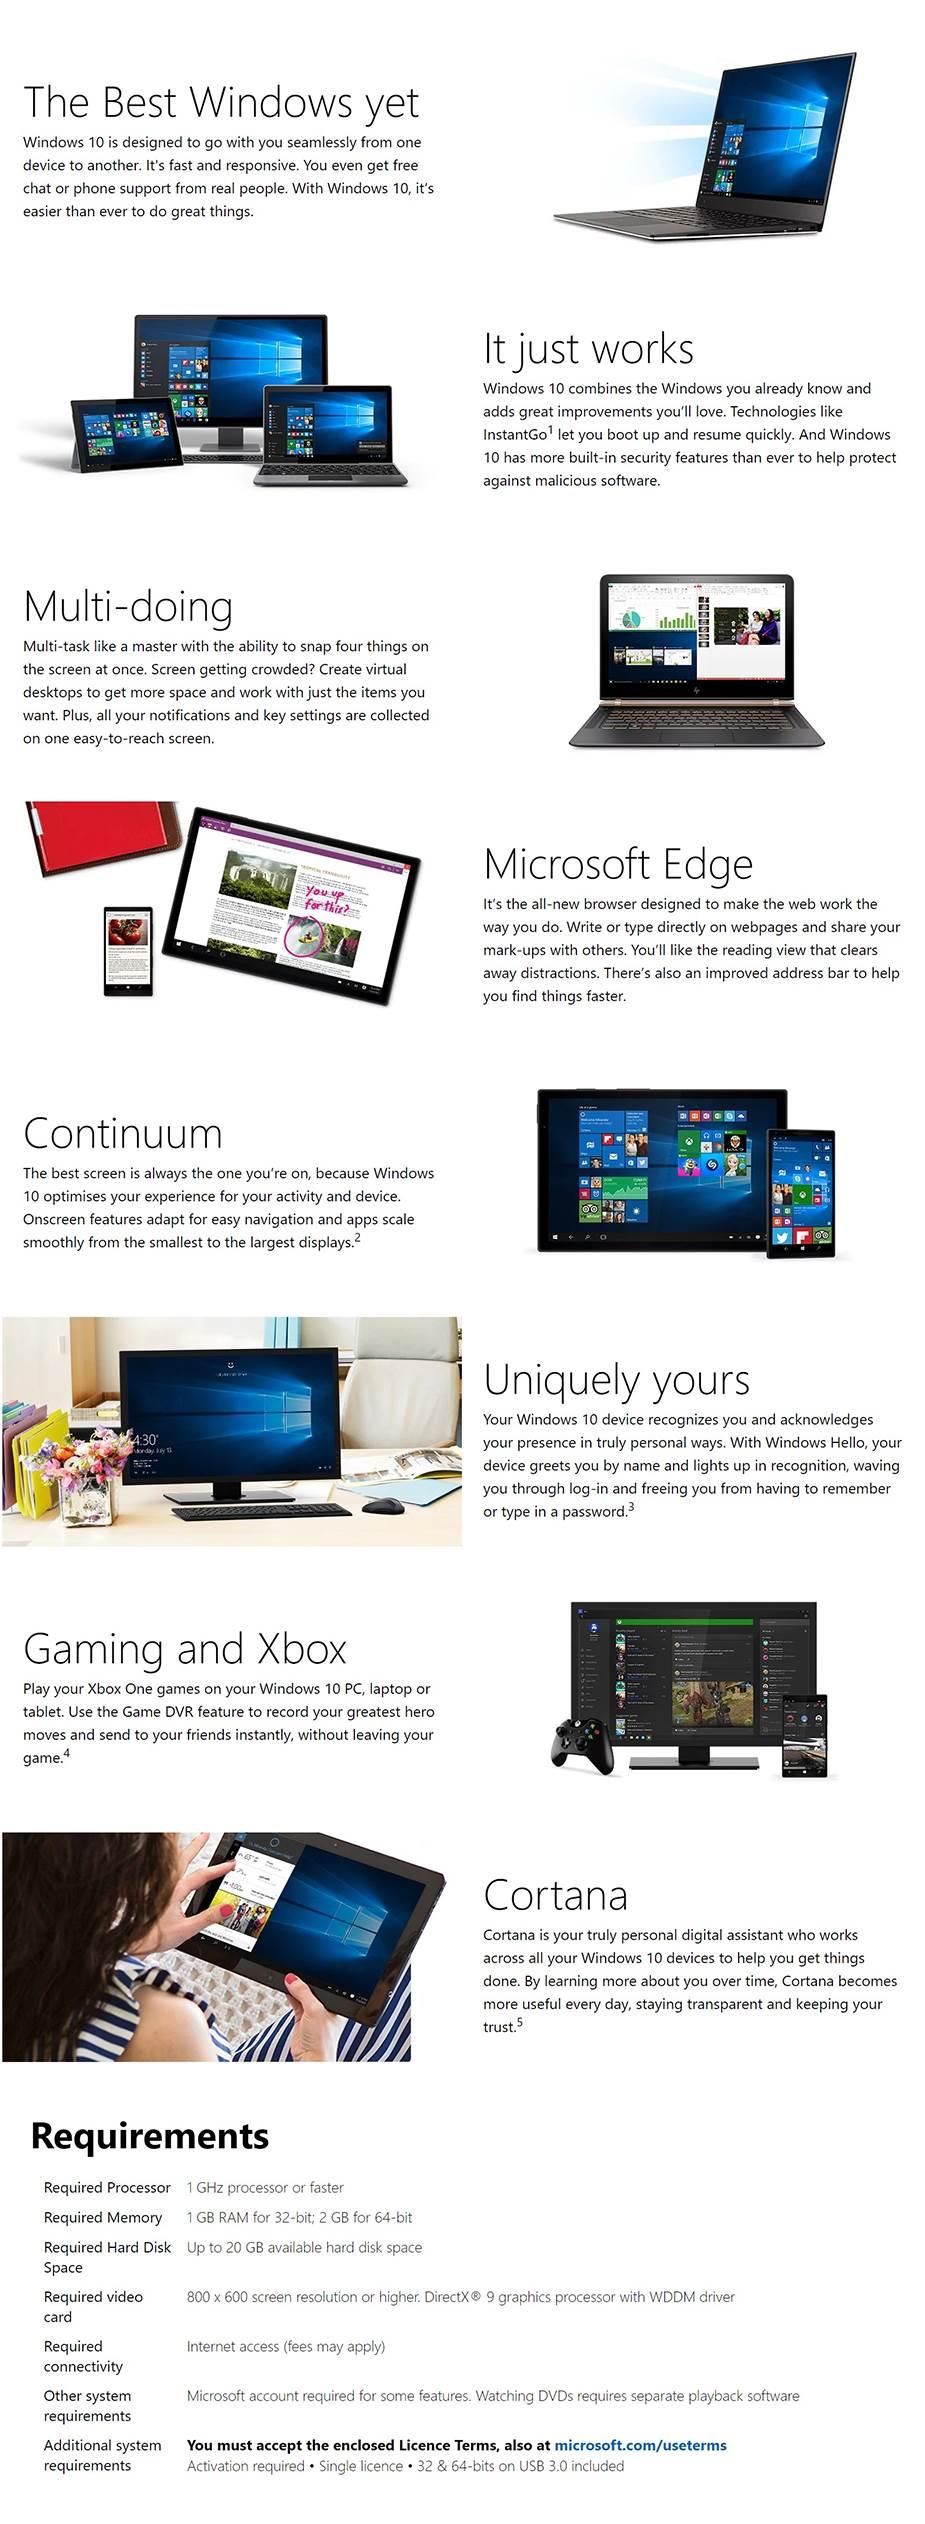 Microsoft Windows 10 Home with Creators Update 32/64-bit USB Drive - Desktop Overview 1